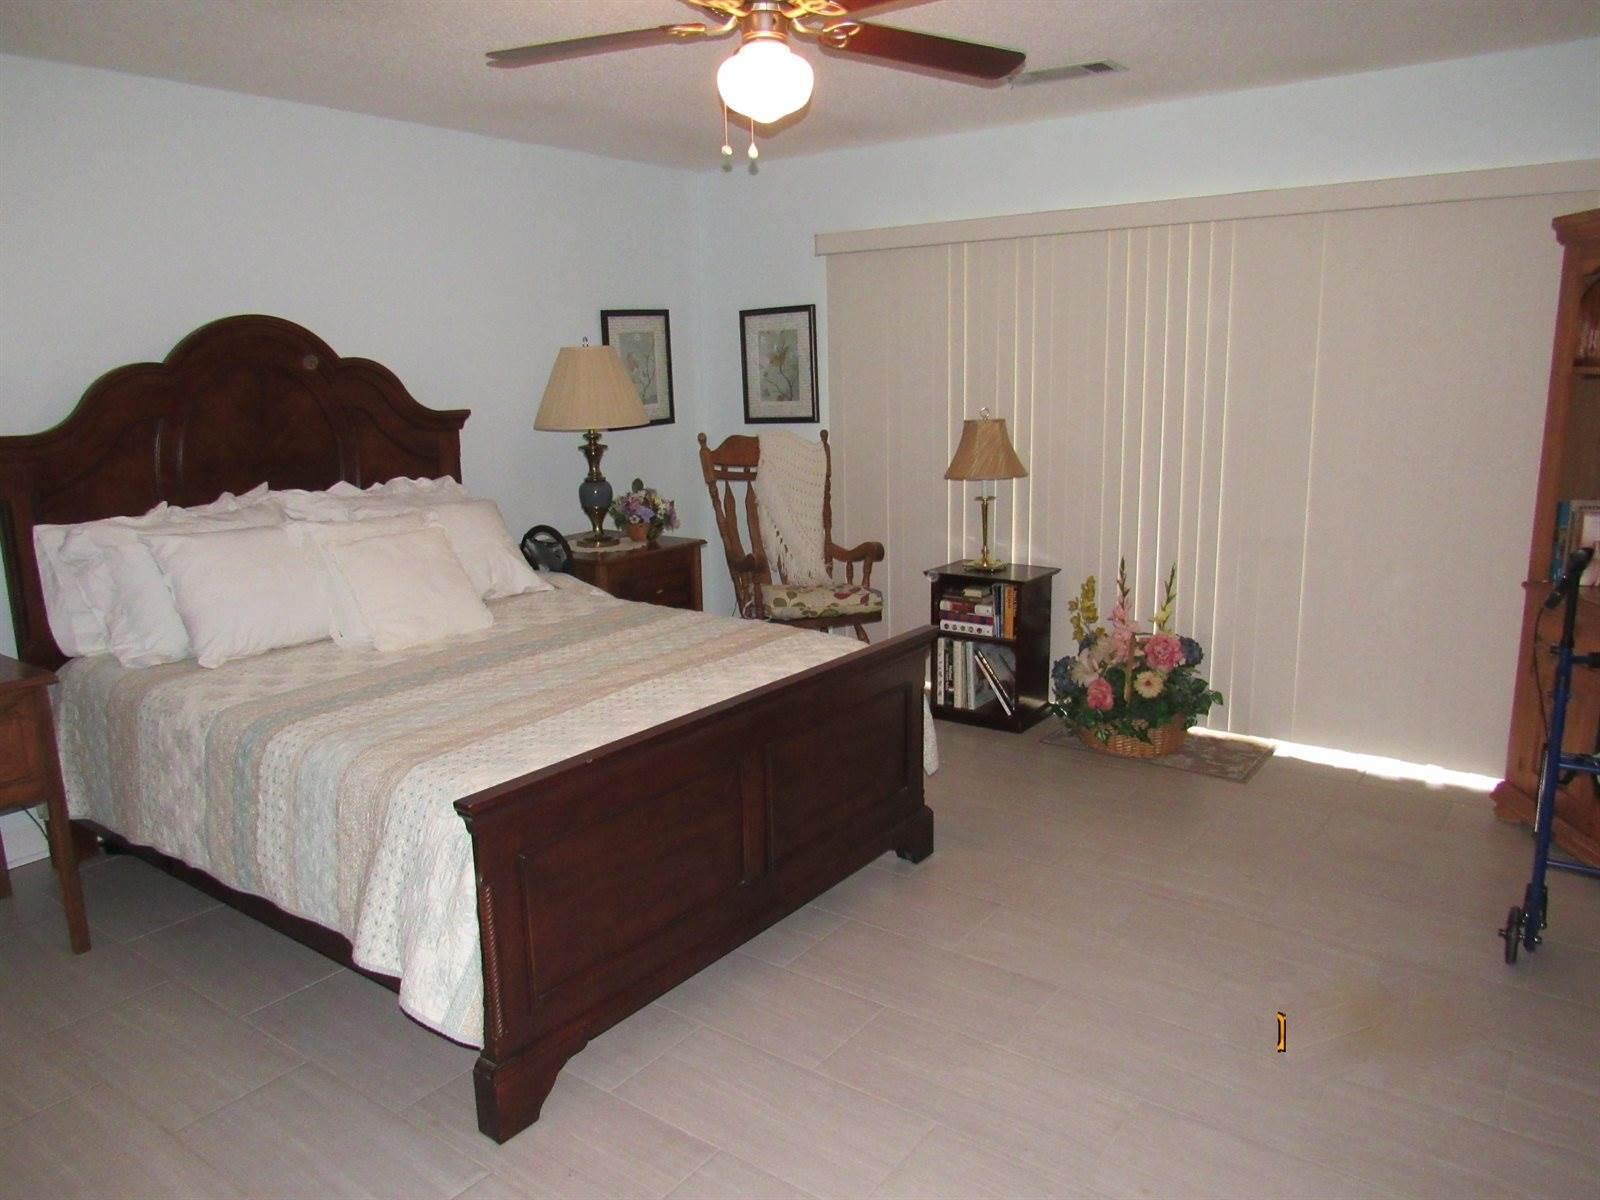 209 Southlake Court, #209, Niceville, FL 32578